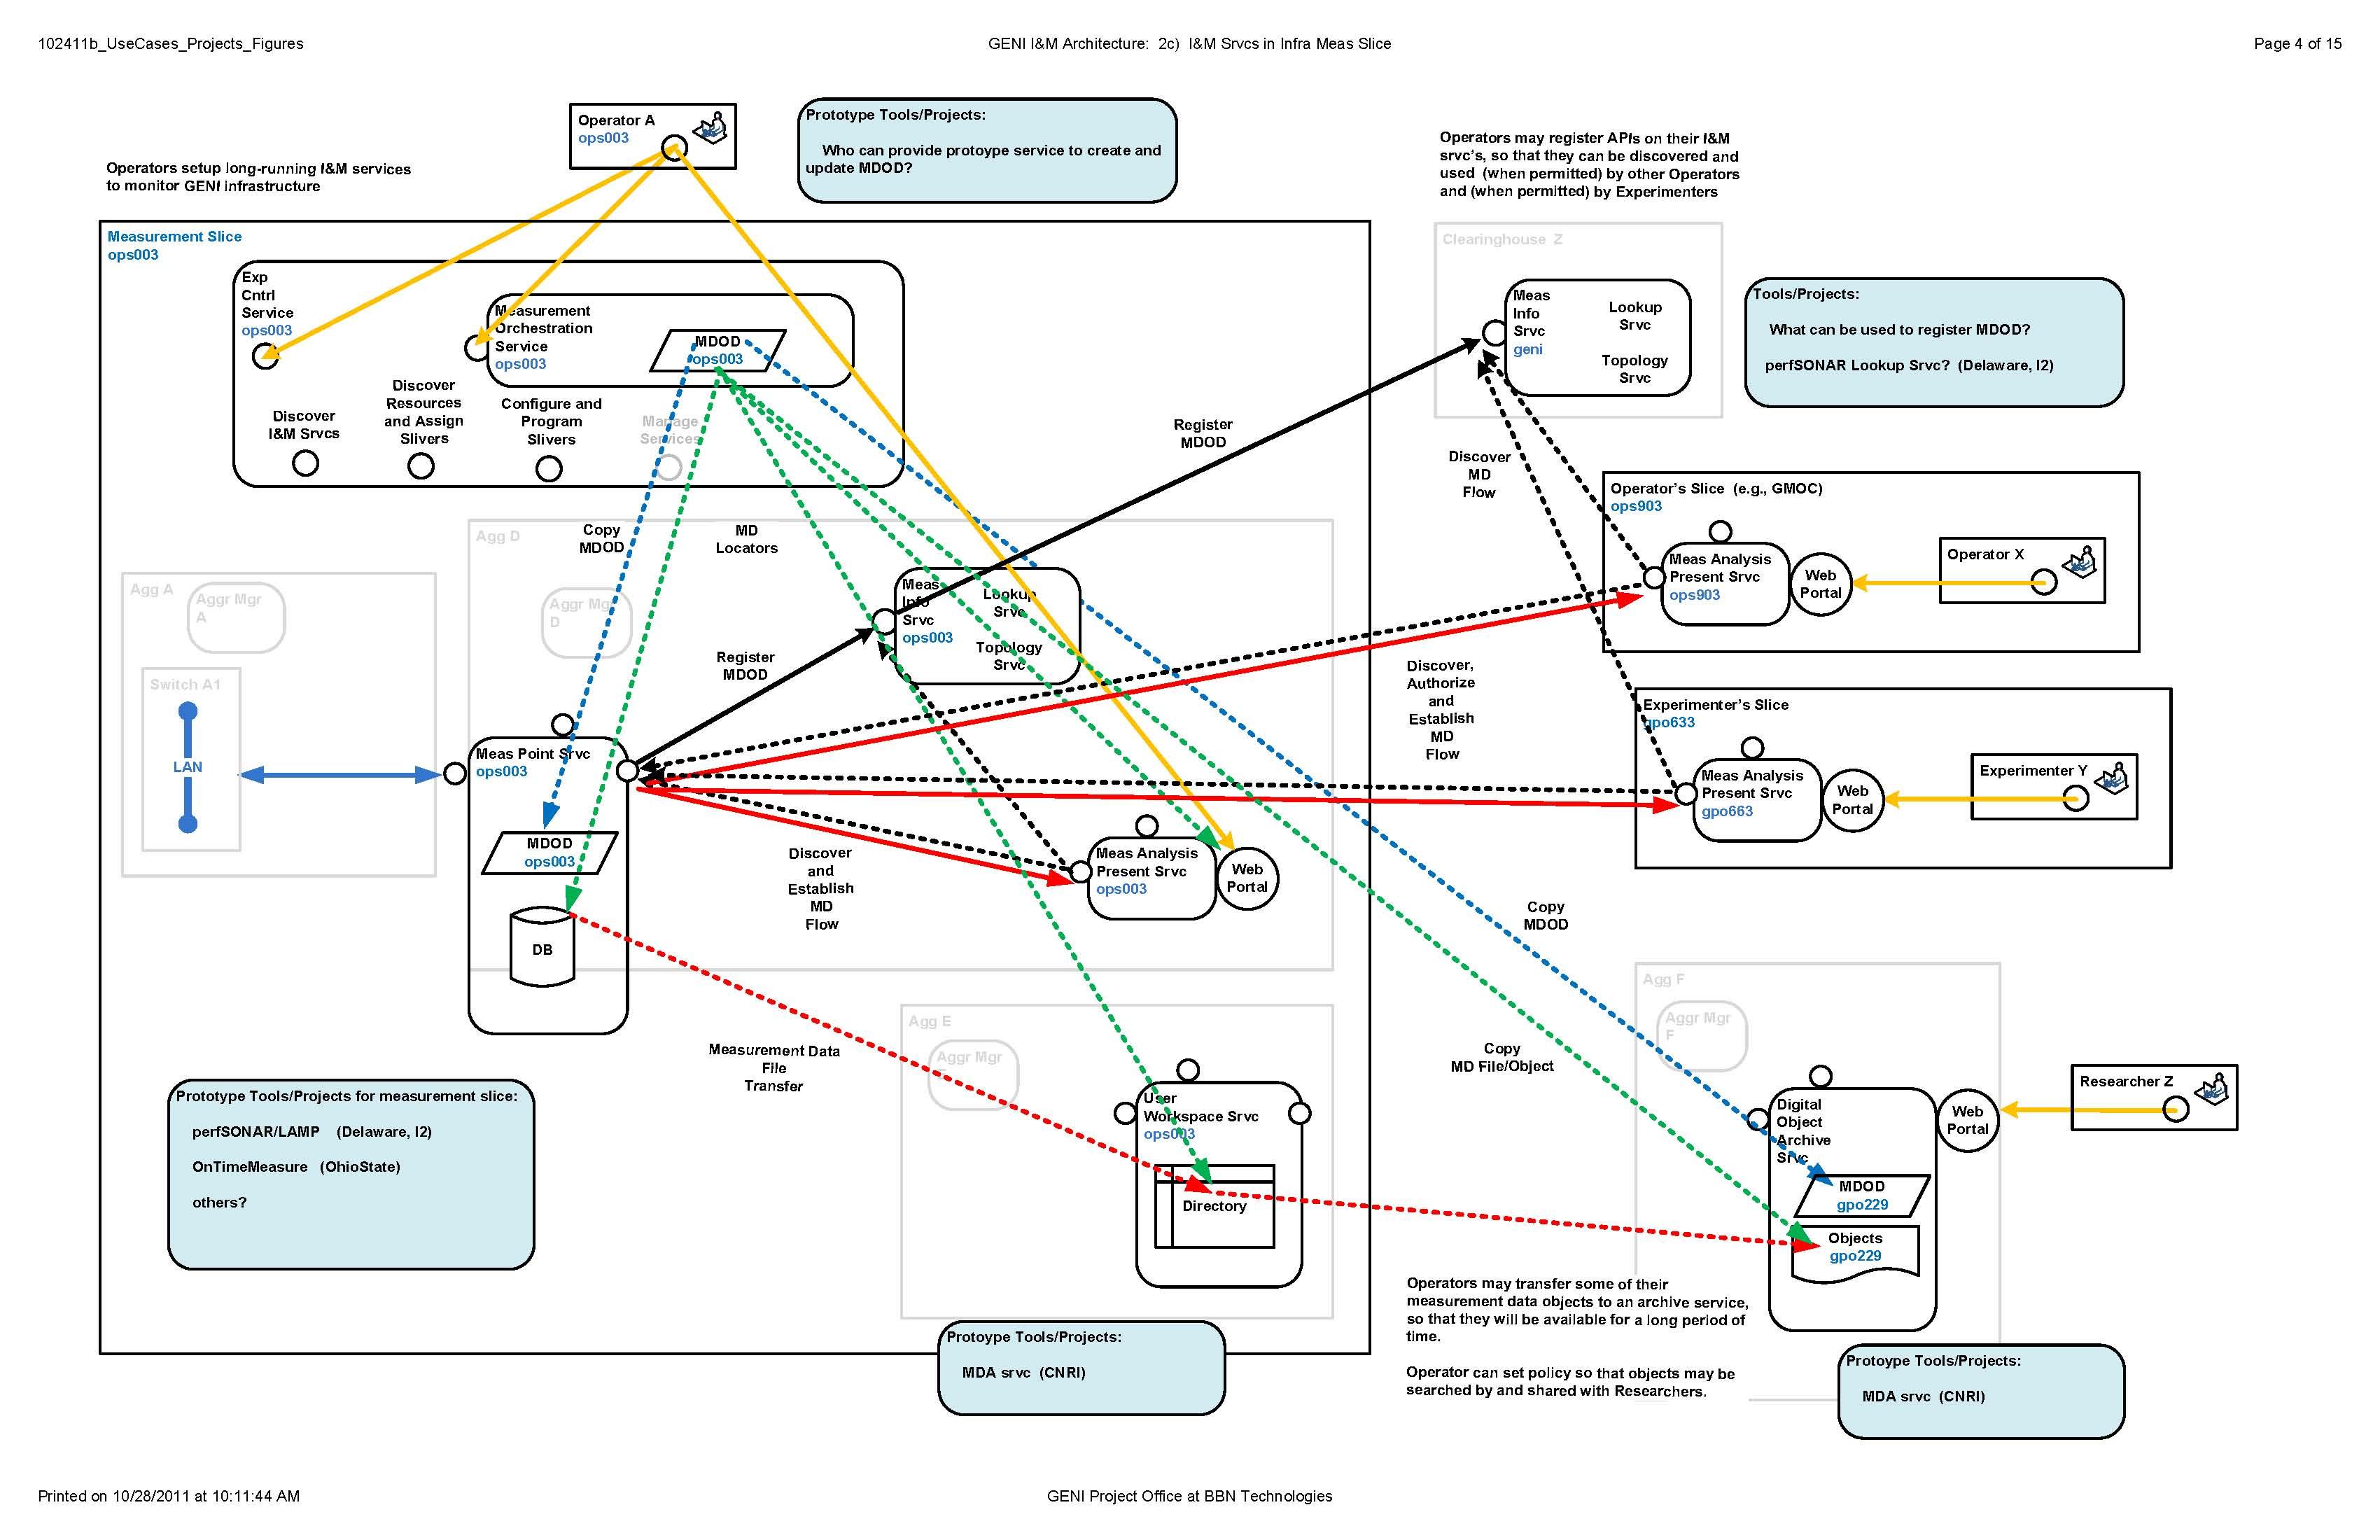 infrastructure architecture visio diagram wiring plug gec12instmeasworkingsession  geni